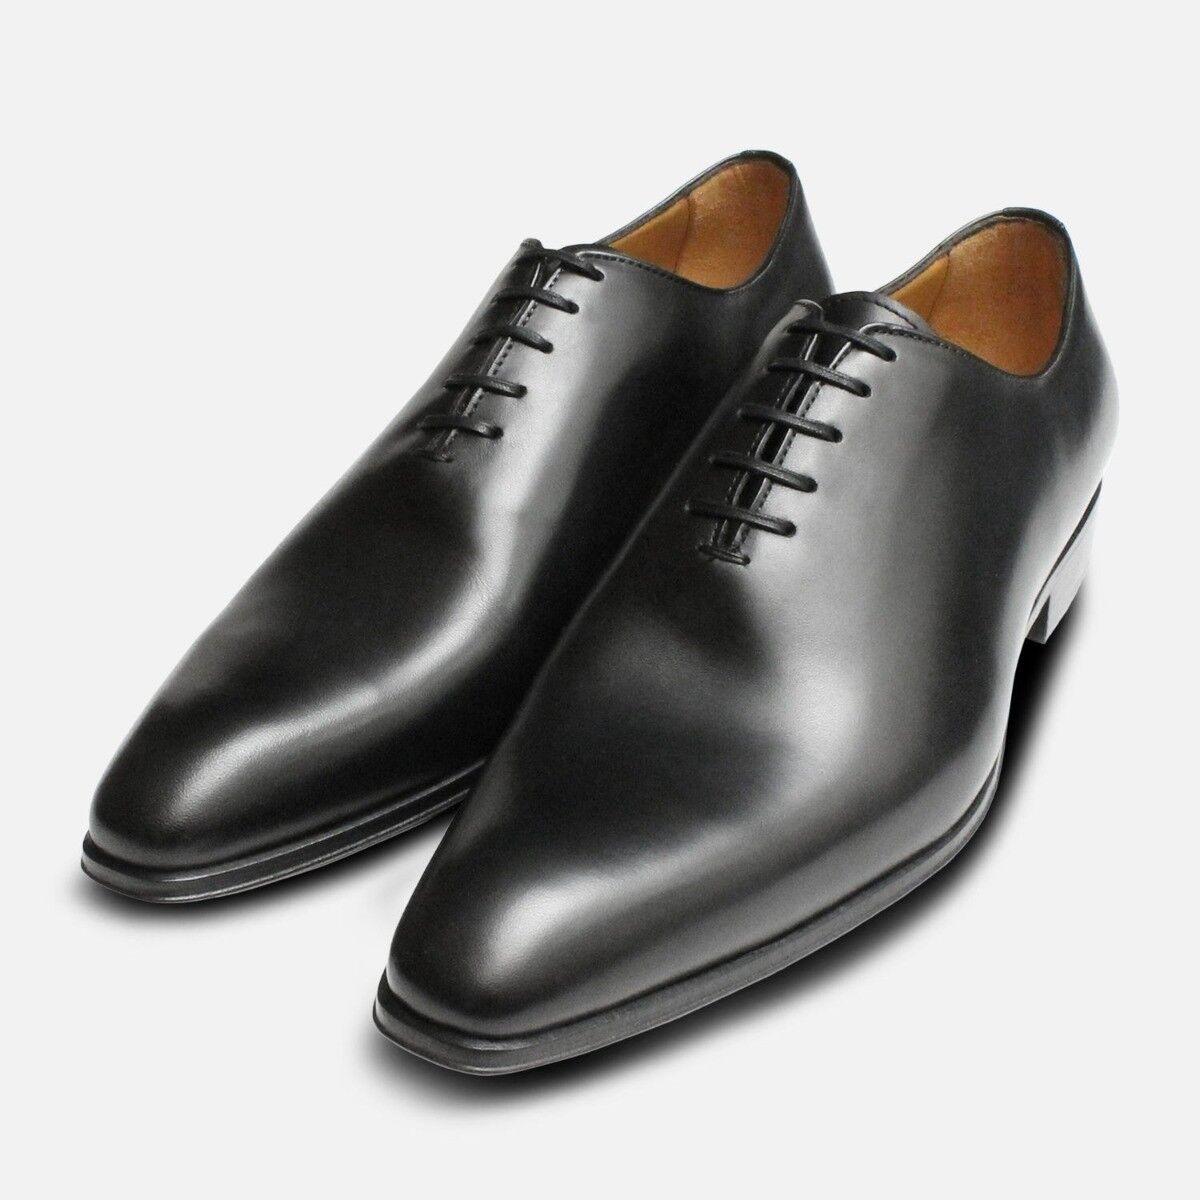 Noir Wholecut Chaussure Oxford Hommes Chaussures